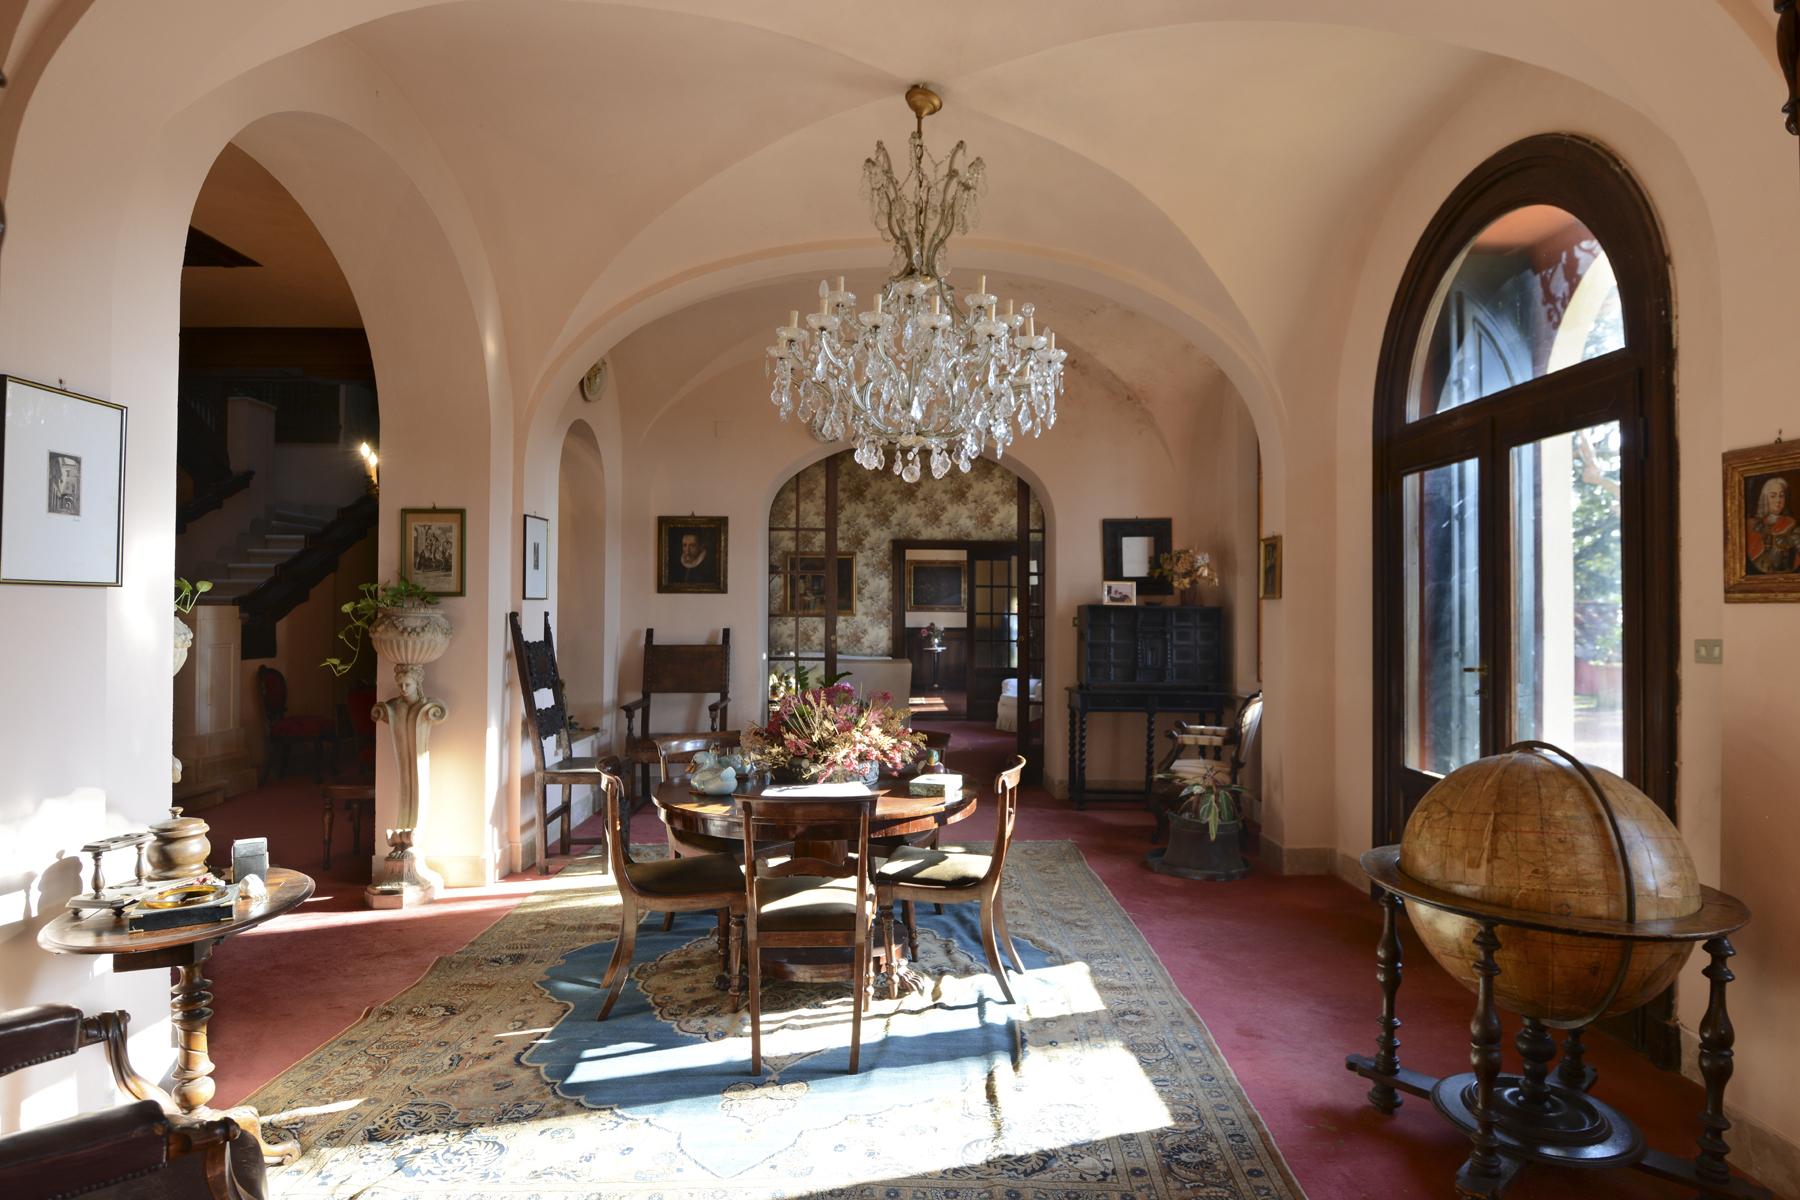 Villa in Vendita a Casciana Terme Lari: 5 locali, 1800 mq - Foto 16